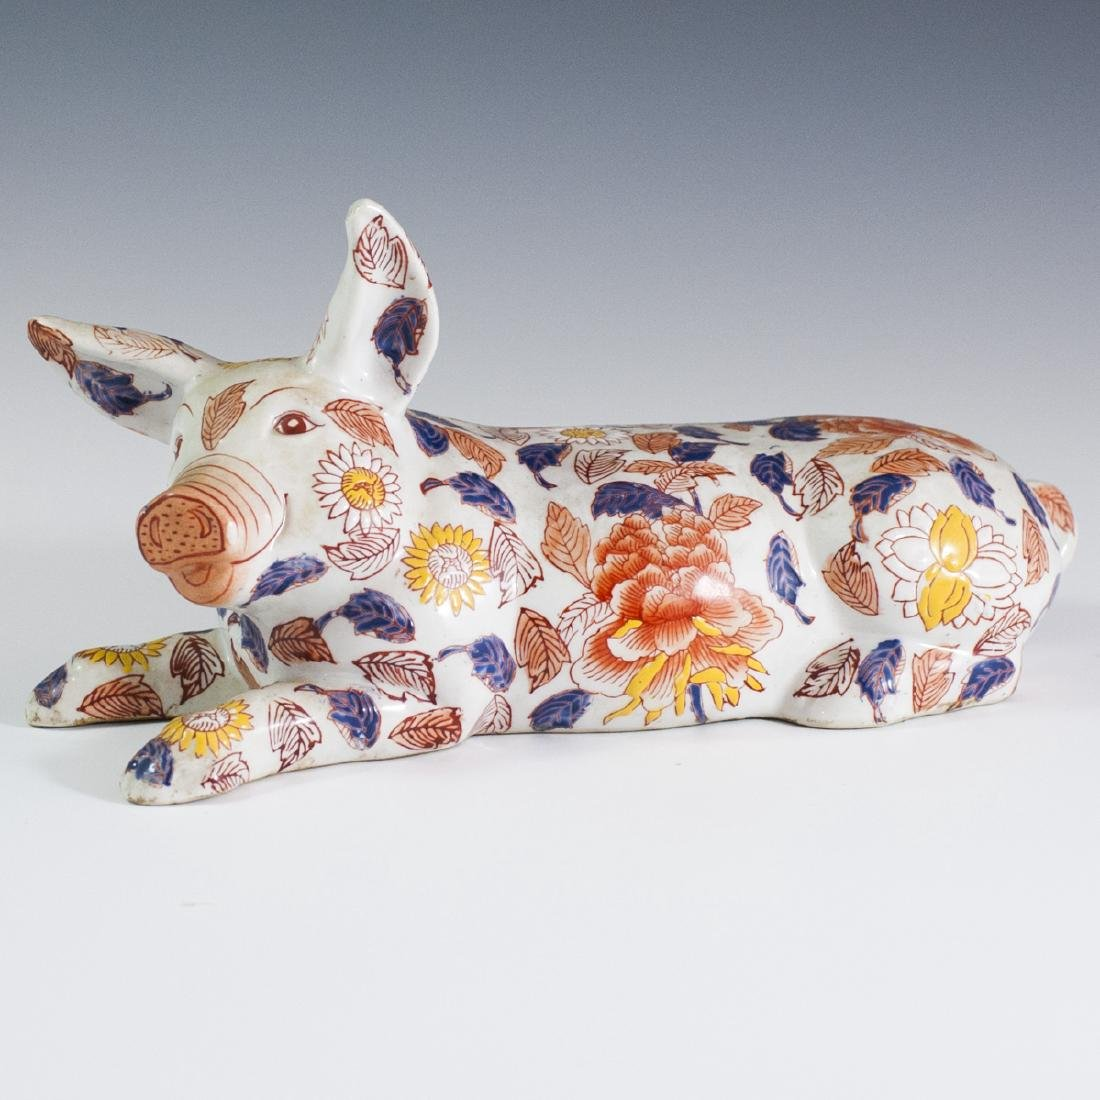 Japanese Enameled Imari Porcelain Pig